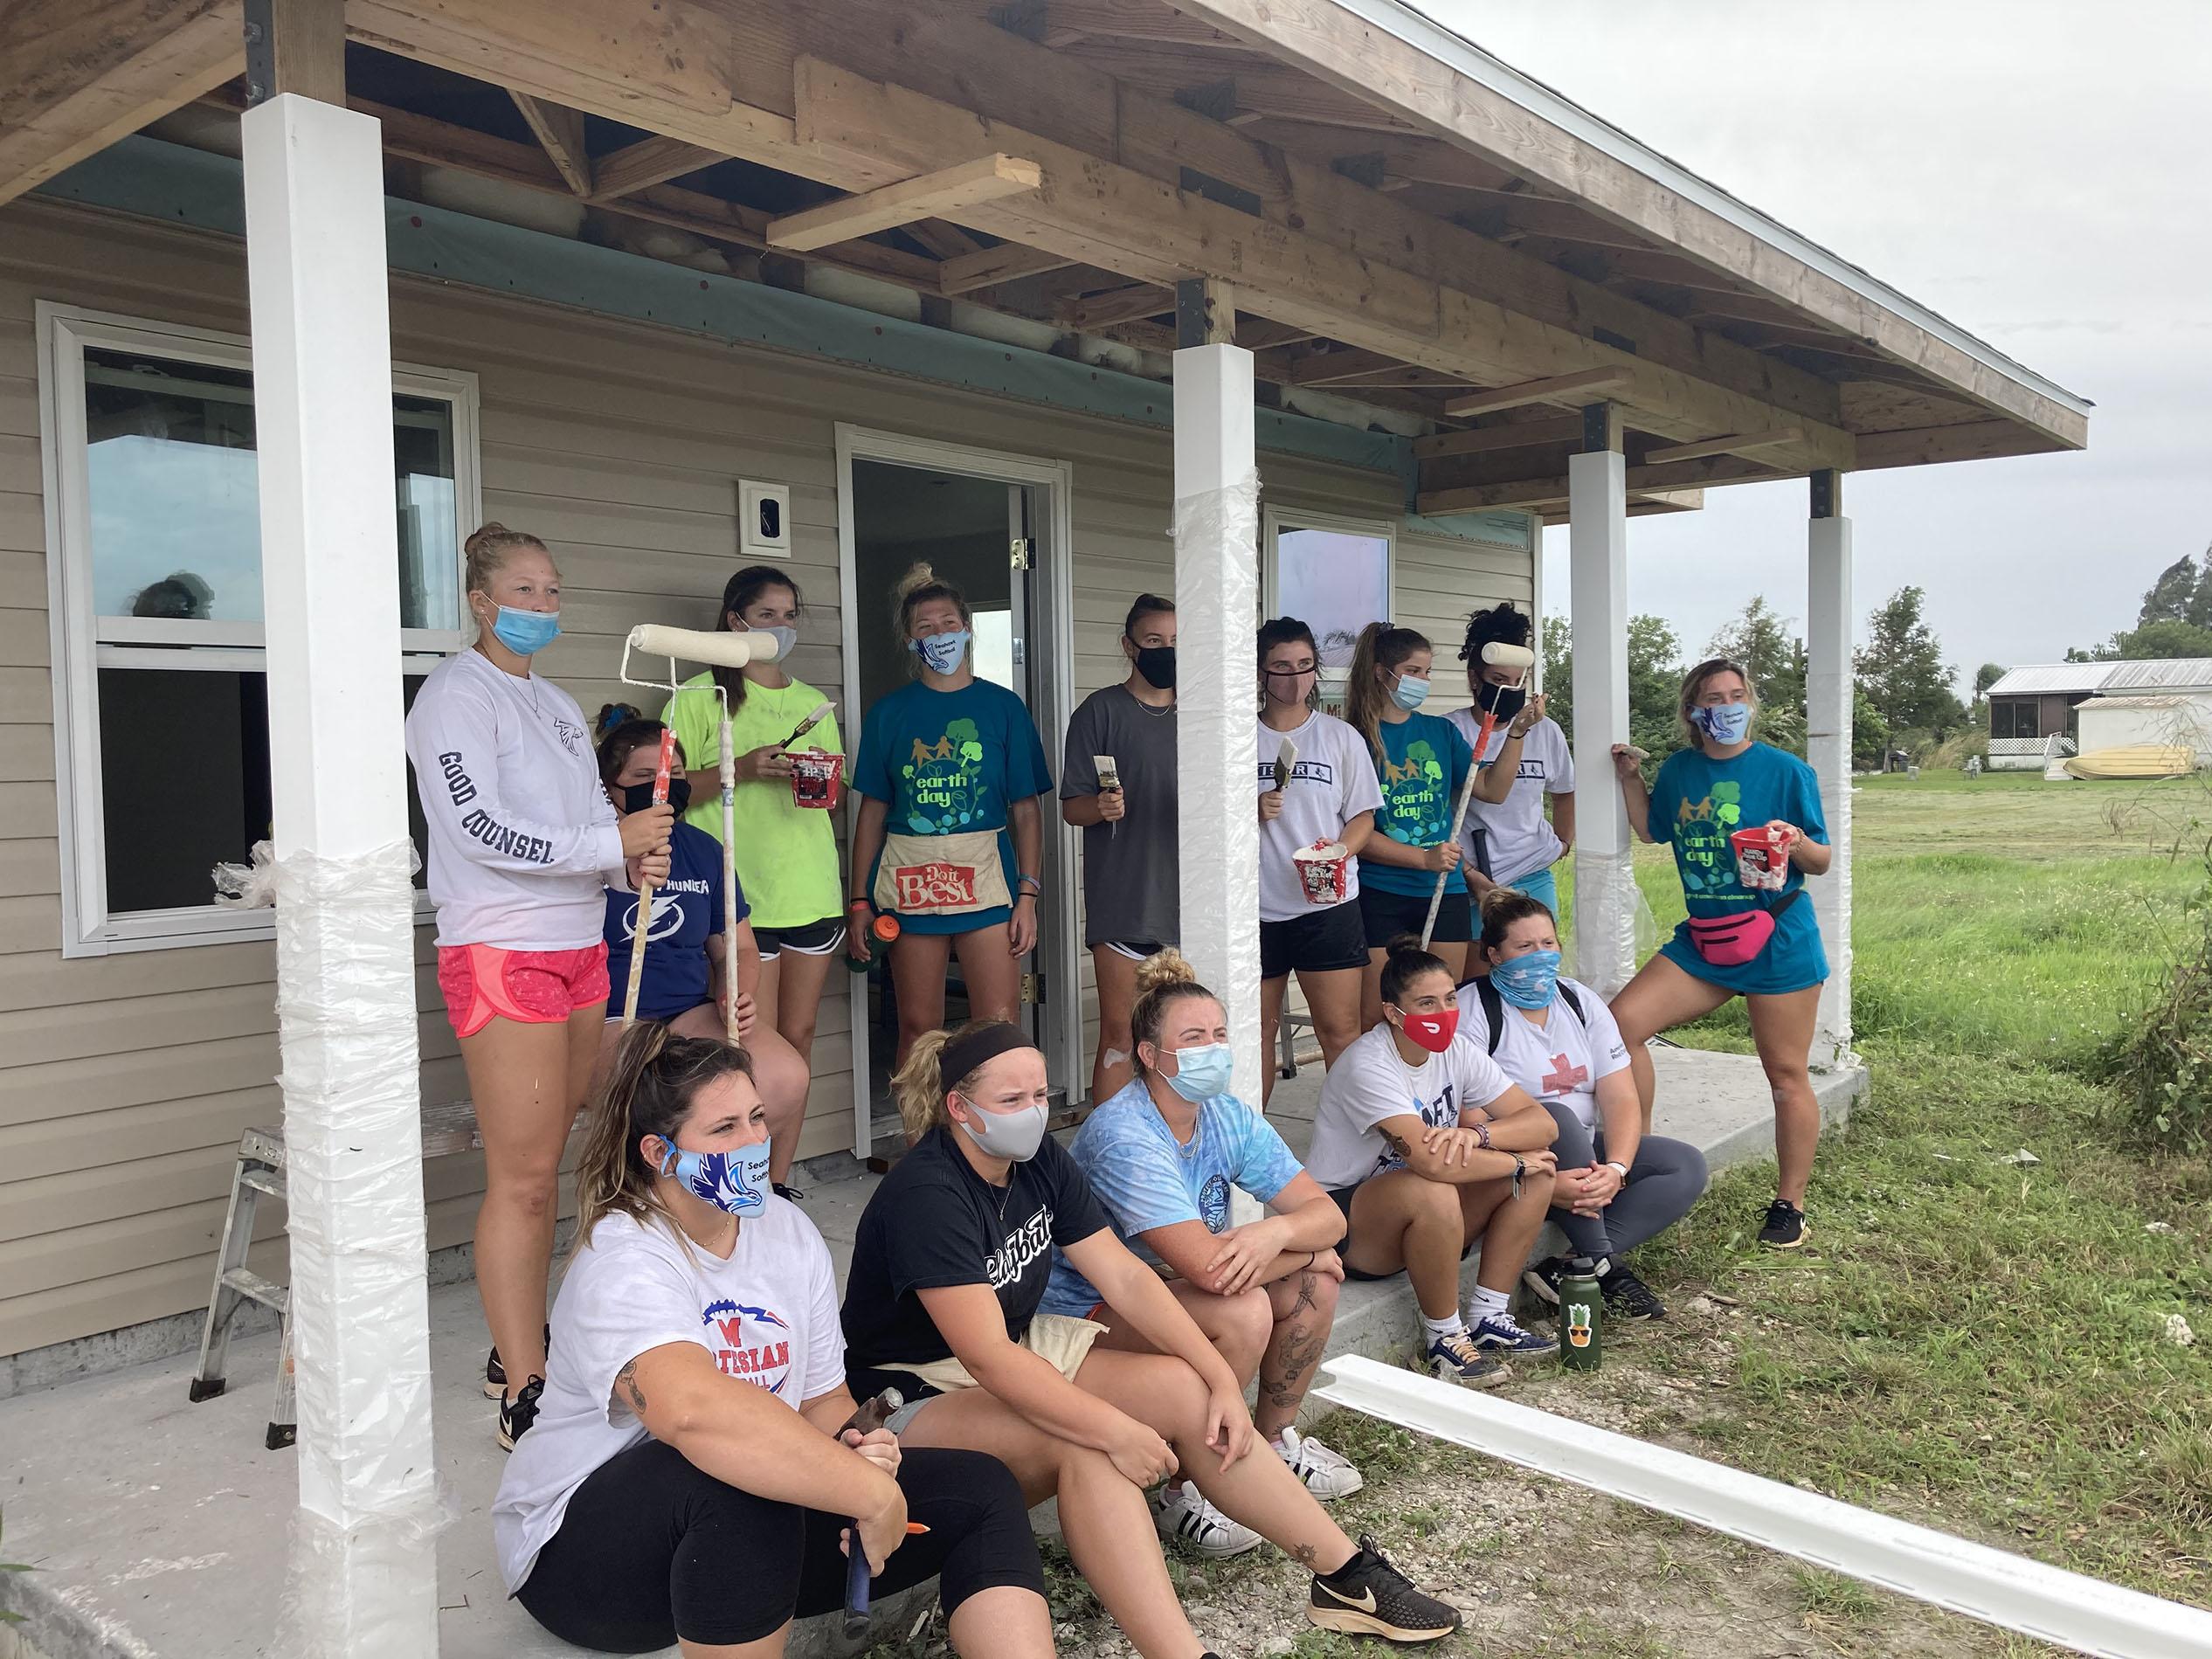 Seahawk Softball Team Members Roll-Up Sleeves for Volunteer Construction Effort